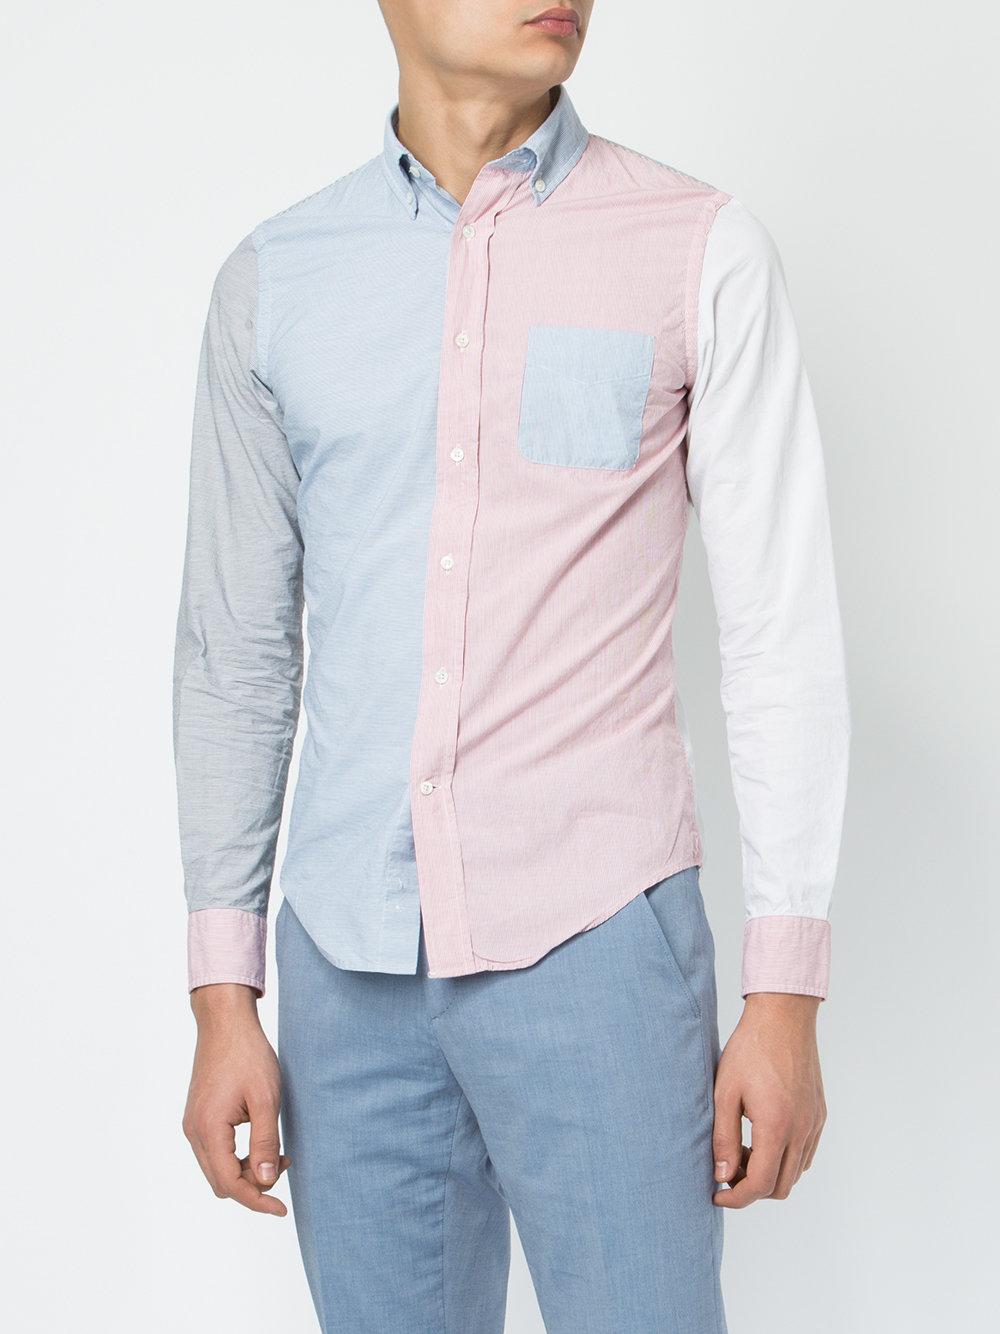 color-block shirt